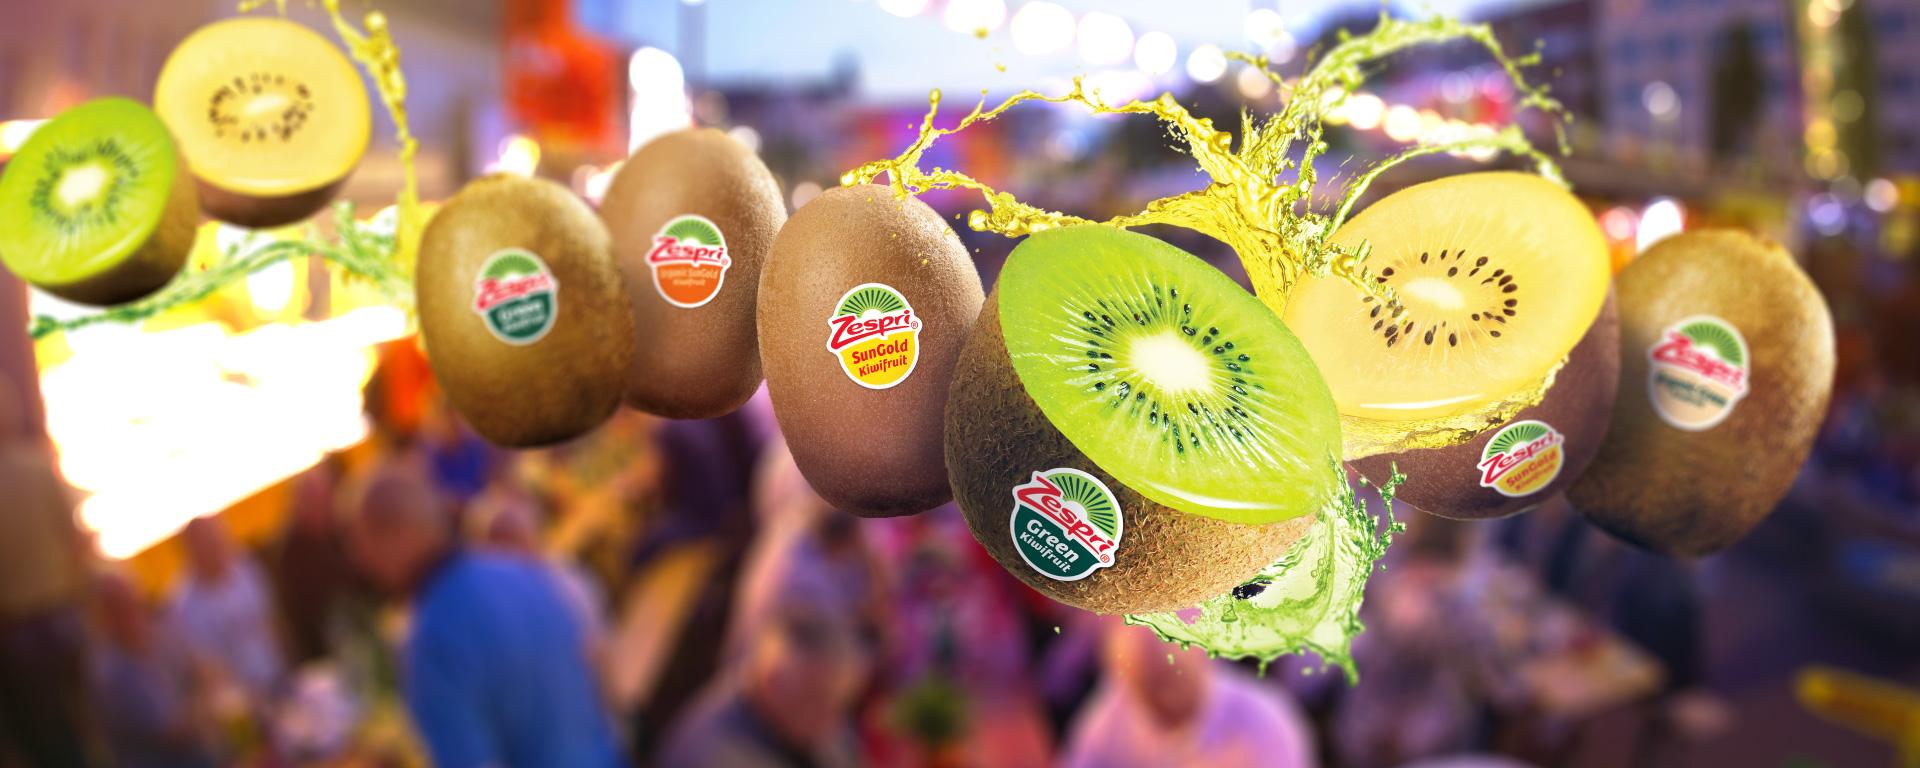 St. Pauli Nachtmarkt – Zespri Kiwi-Special